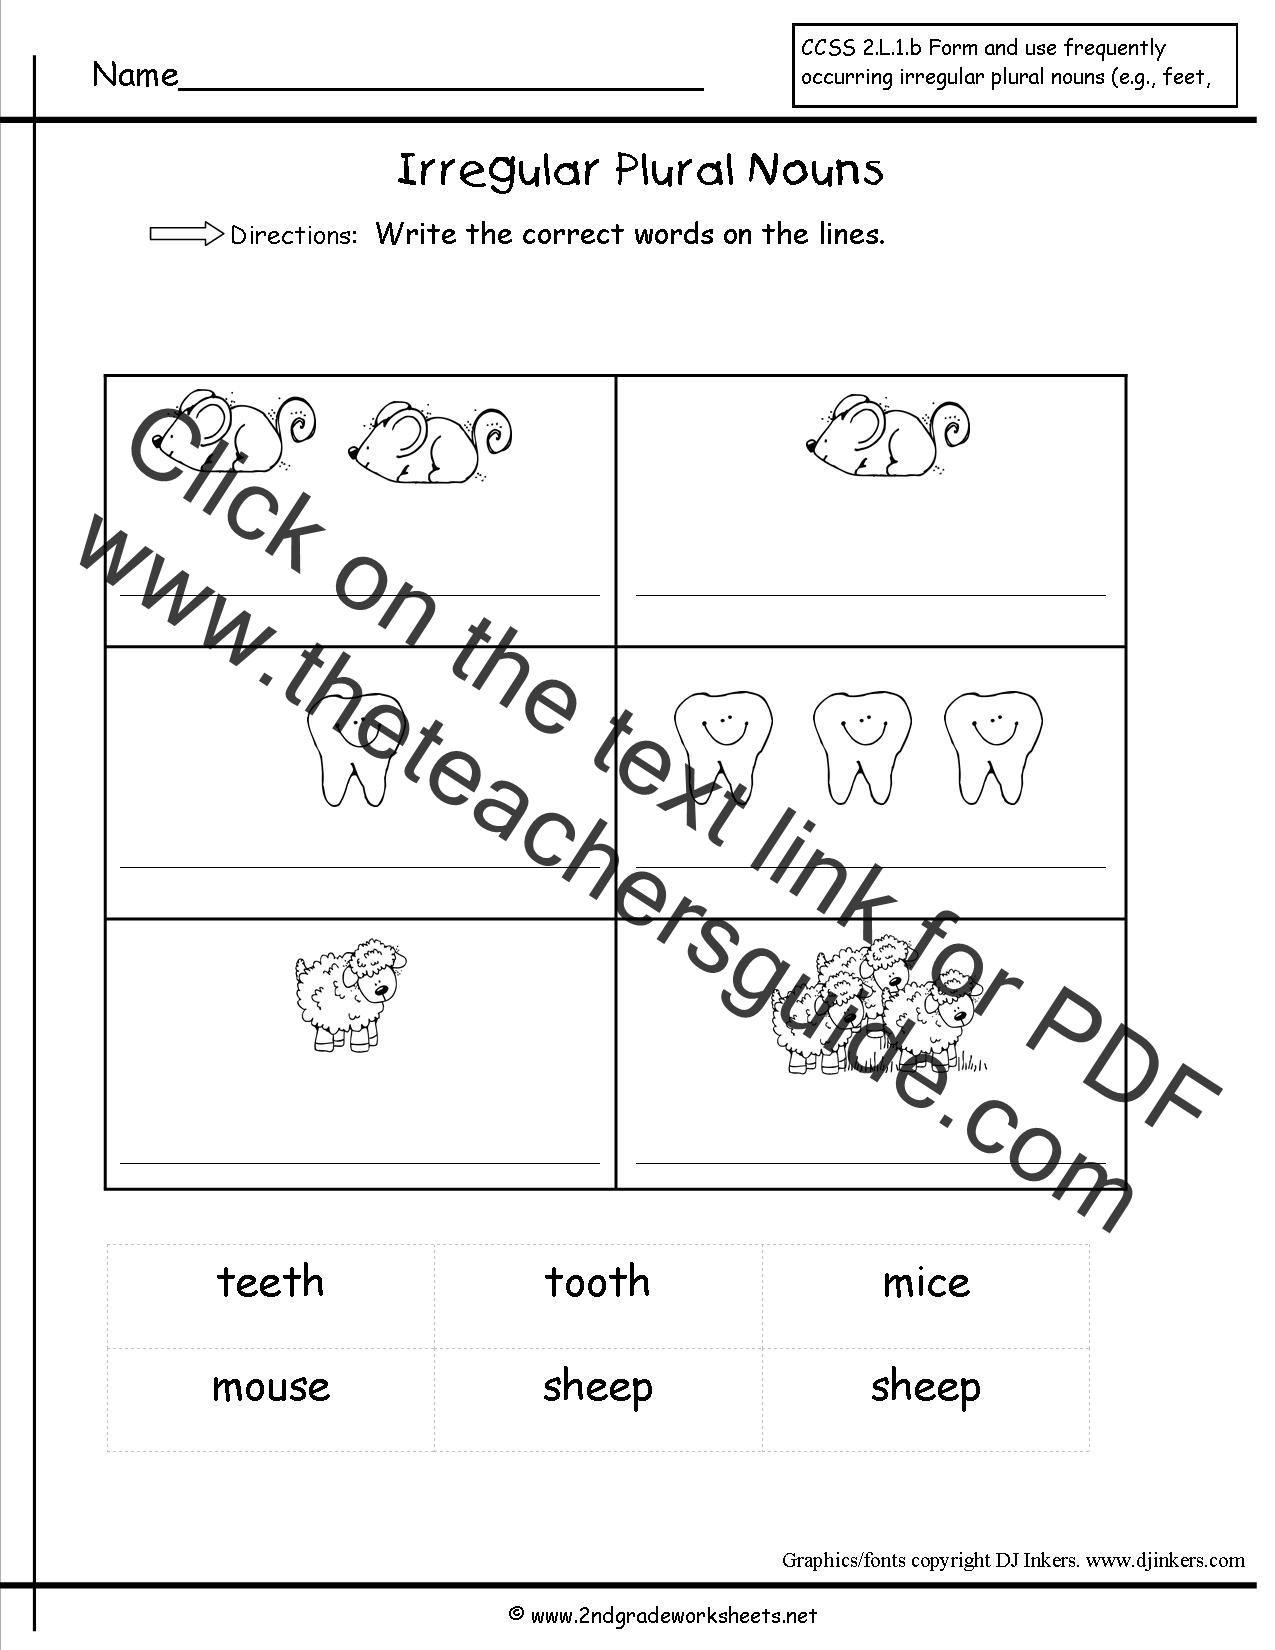 35 Irregular Plural Nouns Worksheet For 3rd Grade